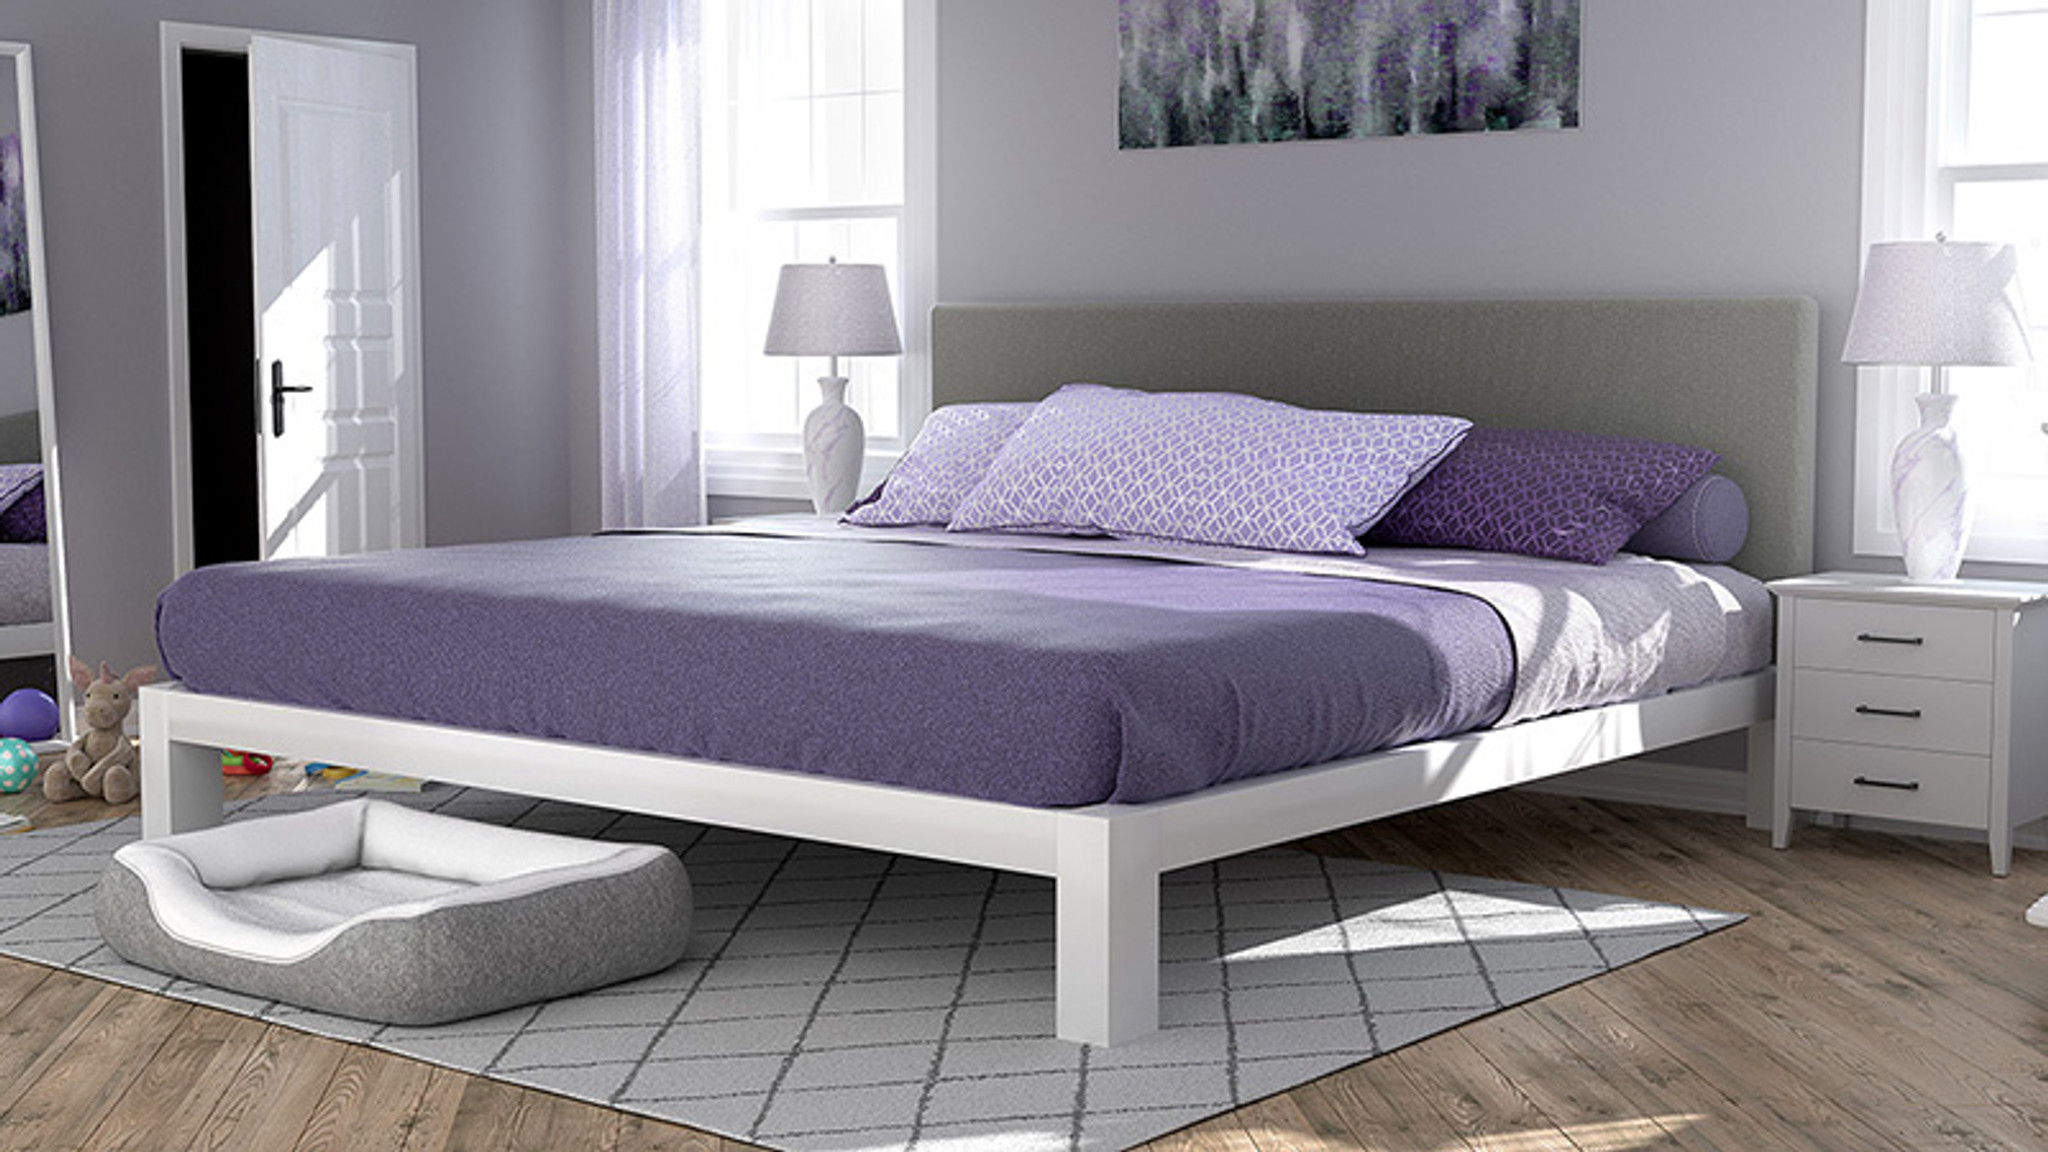 The Big Benefits Of Oversized Or Custom Bedding Vero Linens